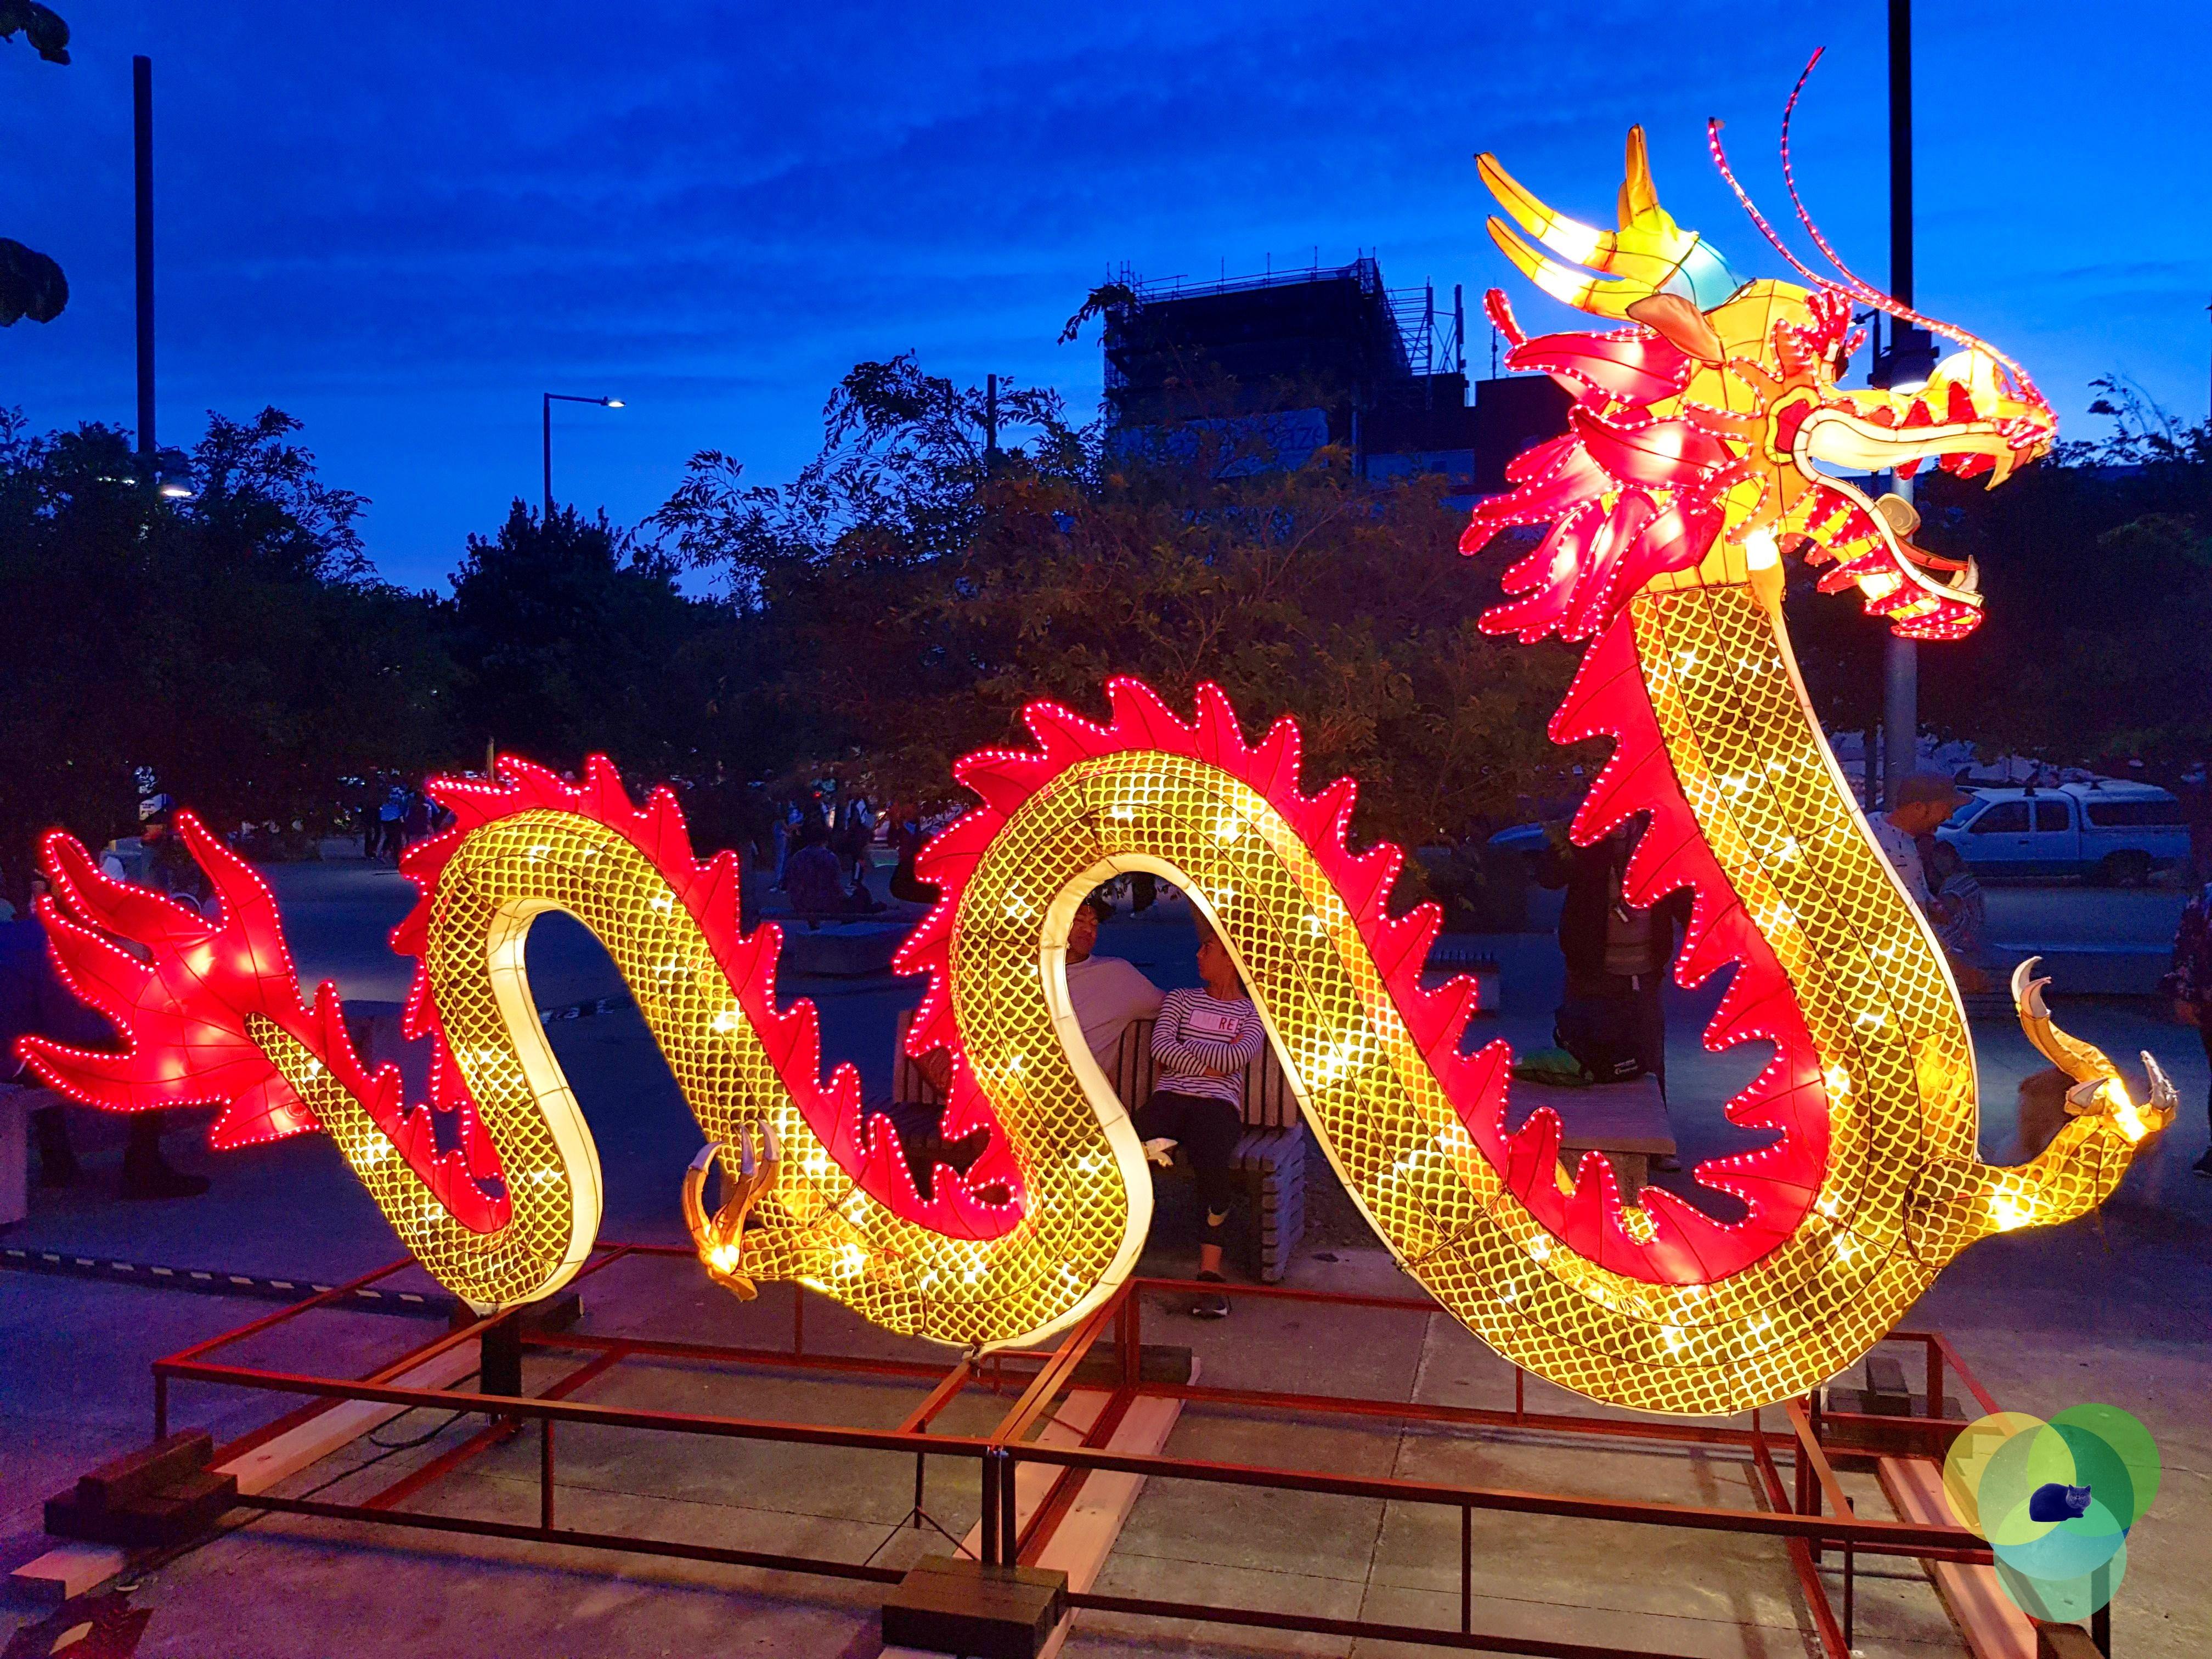 Travel: Wellington's Chinese New Year Lantern Festival